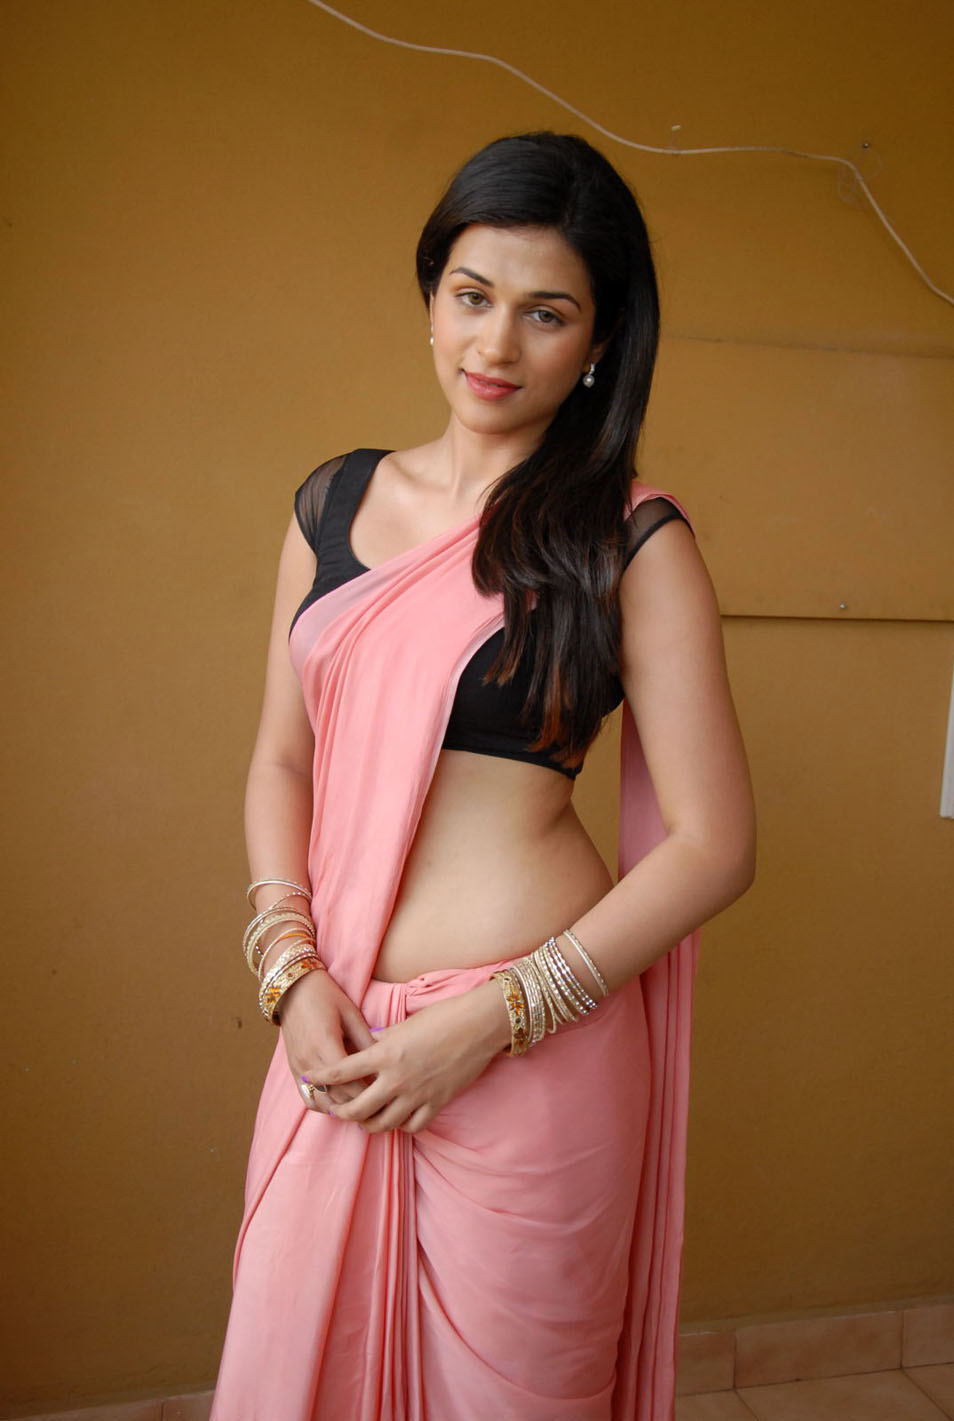 Lakshmi menon unseen boobs show in public - 2 6